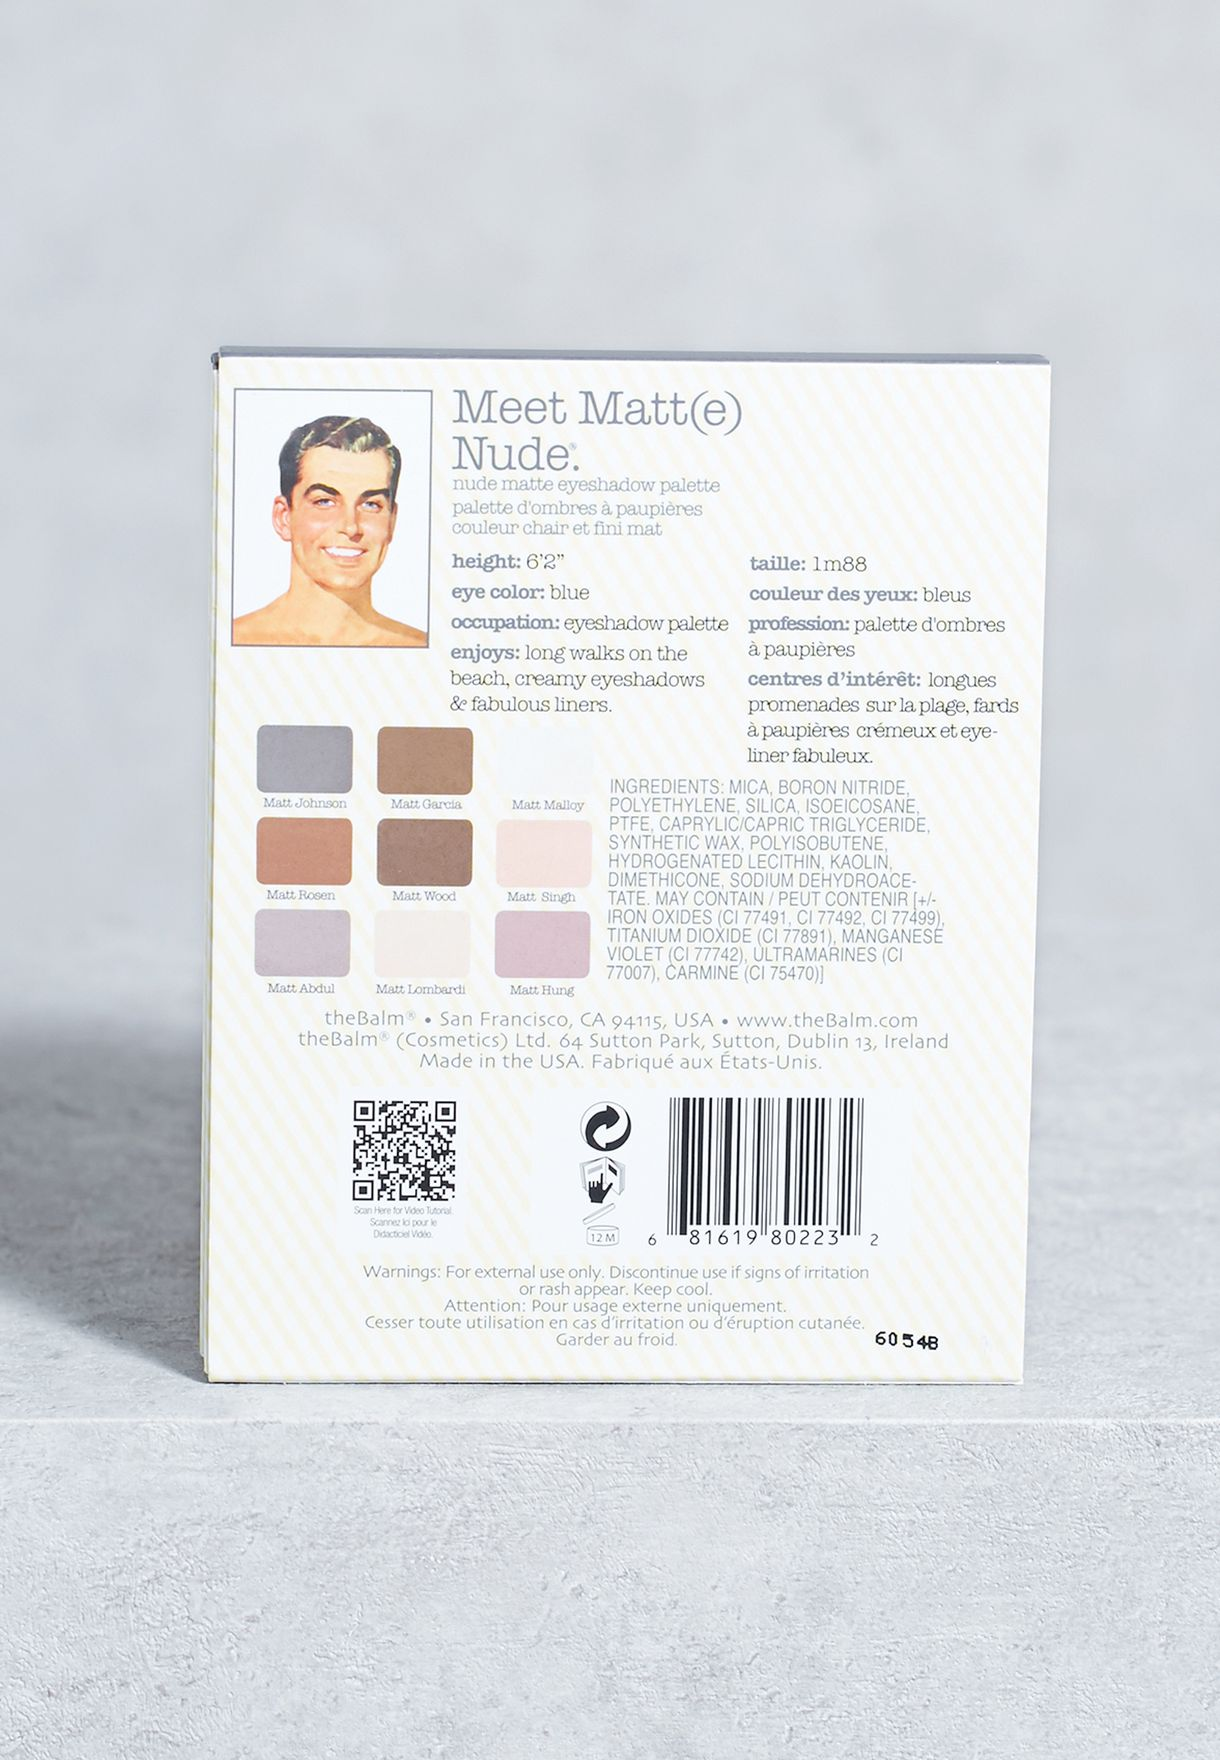 Meet Matt(E) Nude Eyeshadow Paletts